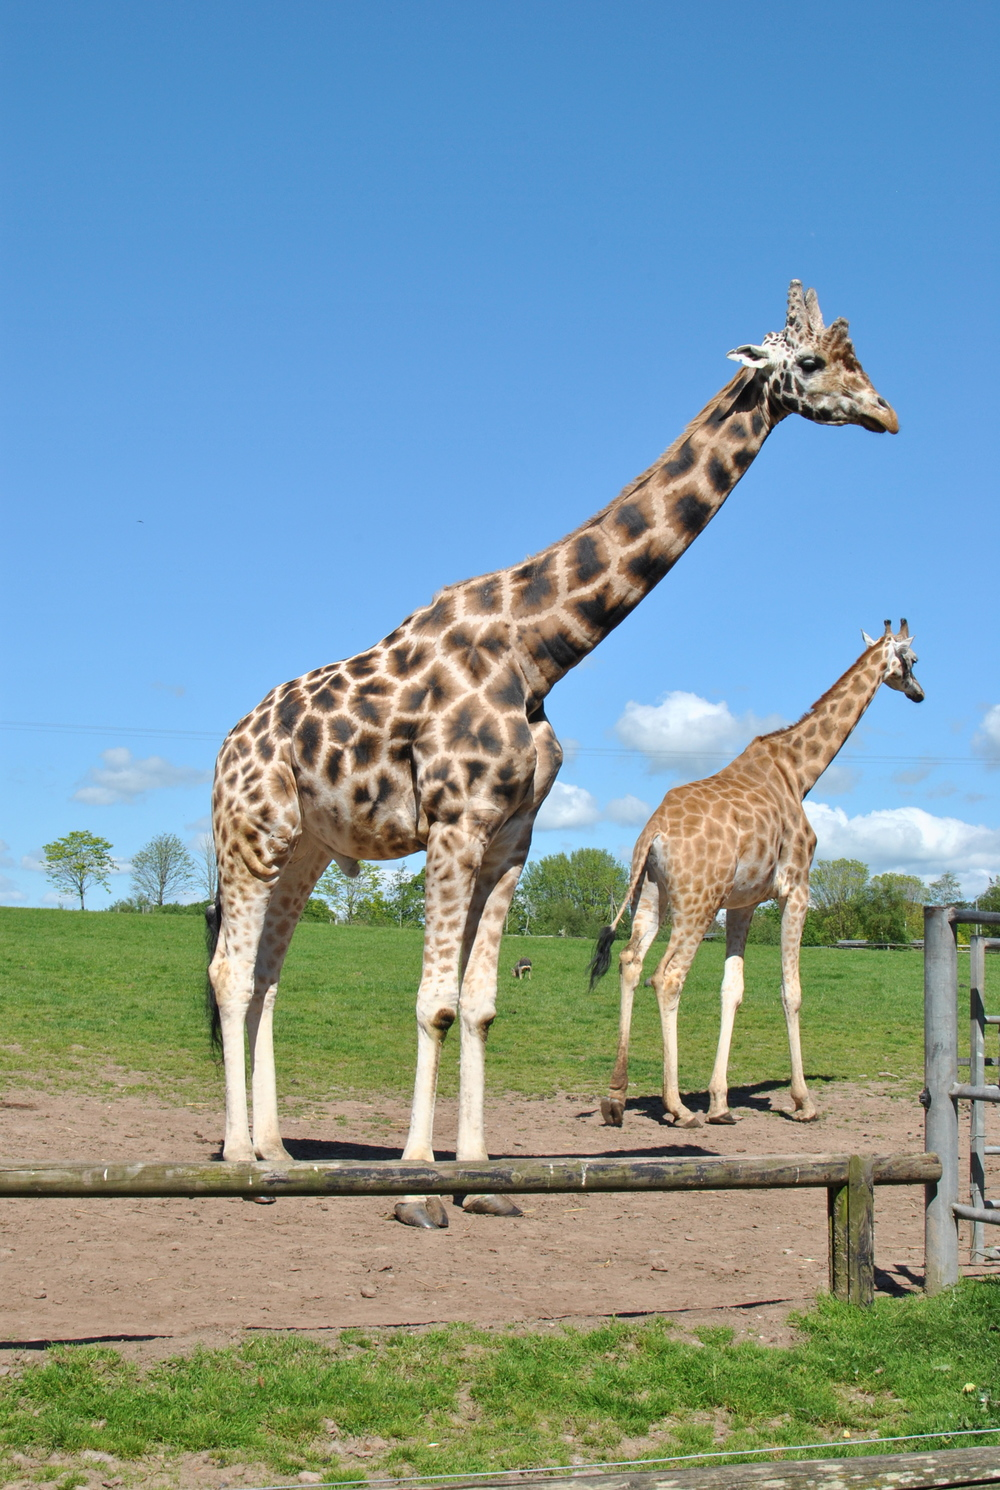 Some of the giraffes at Fota Island Wildlife park  http://www.fotawildlife.ie